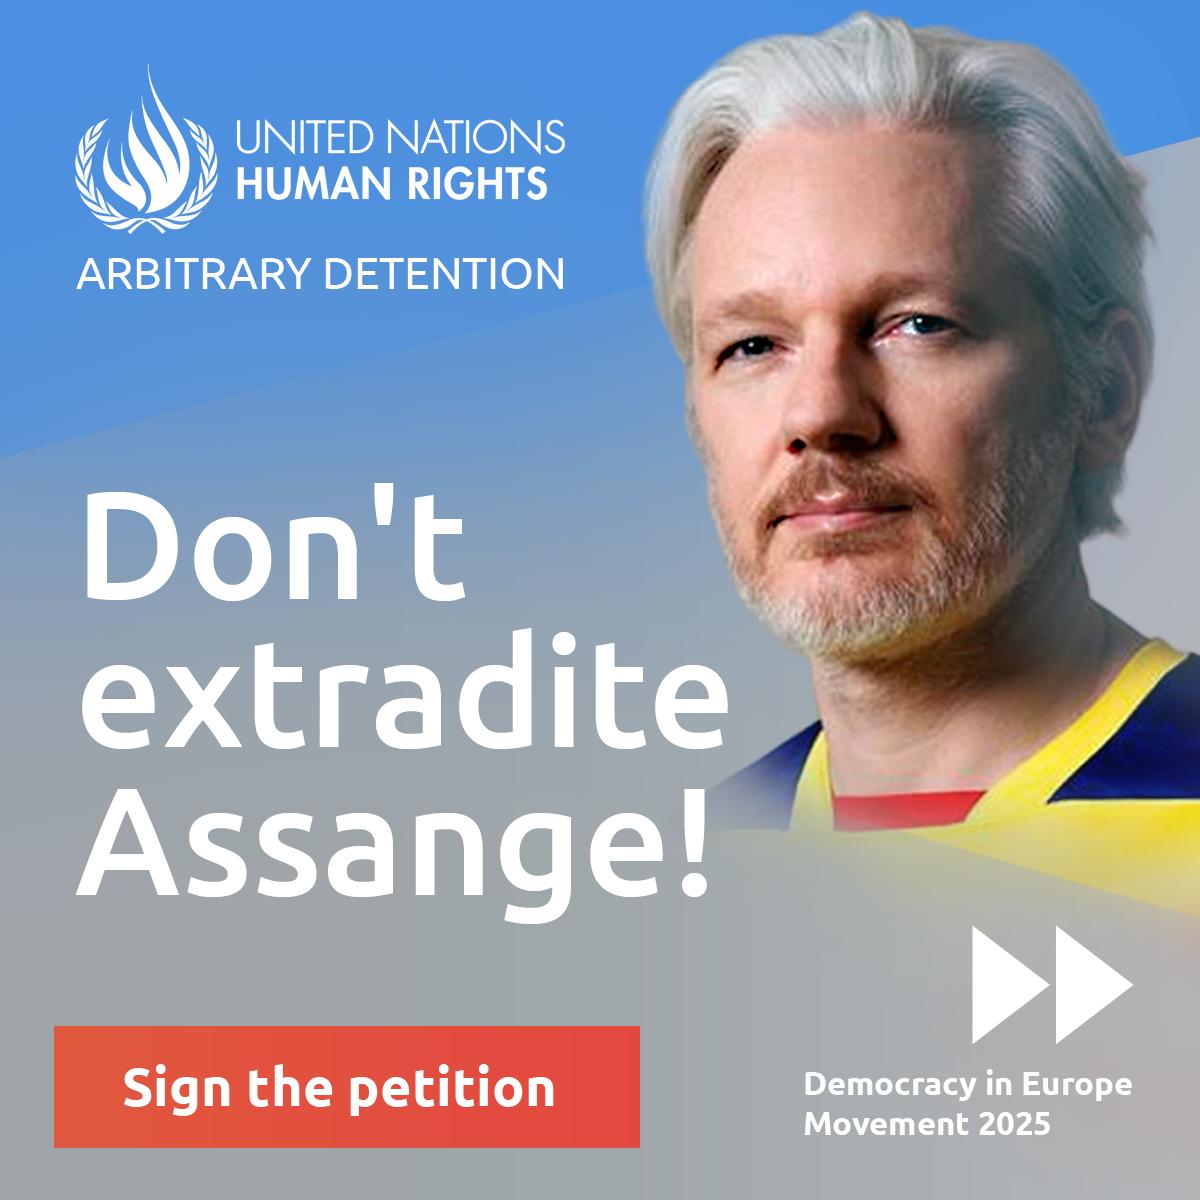 Don't extradite Assange! (petition)